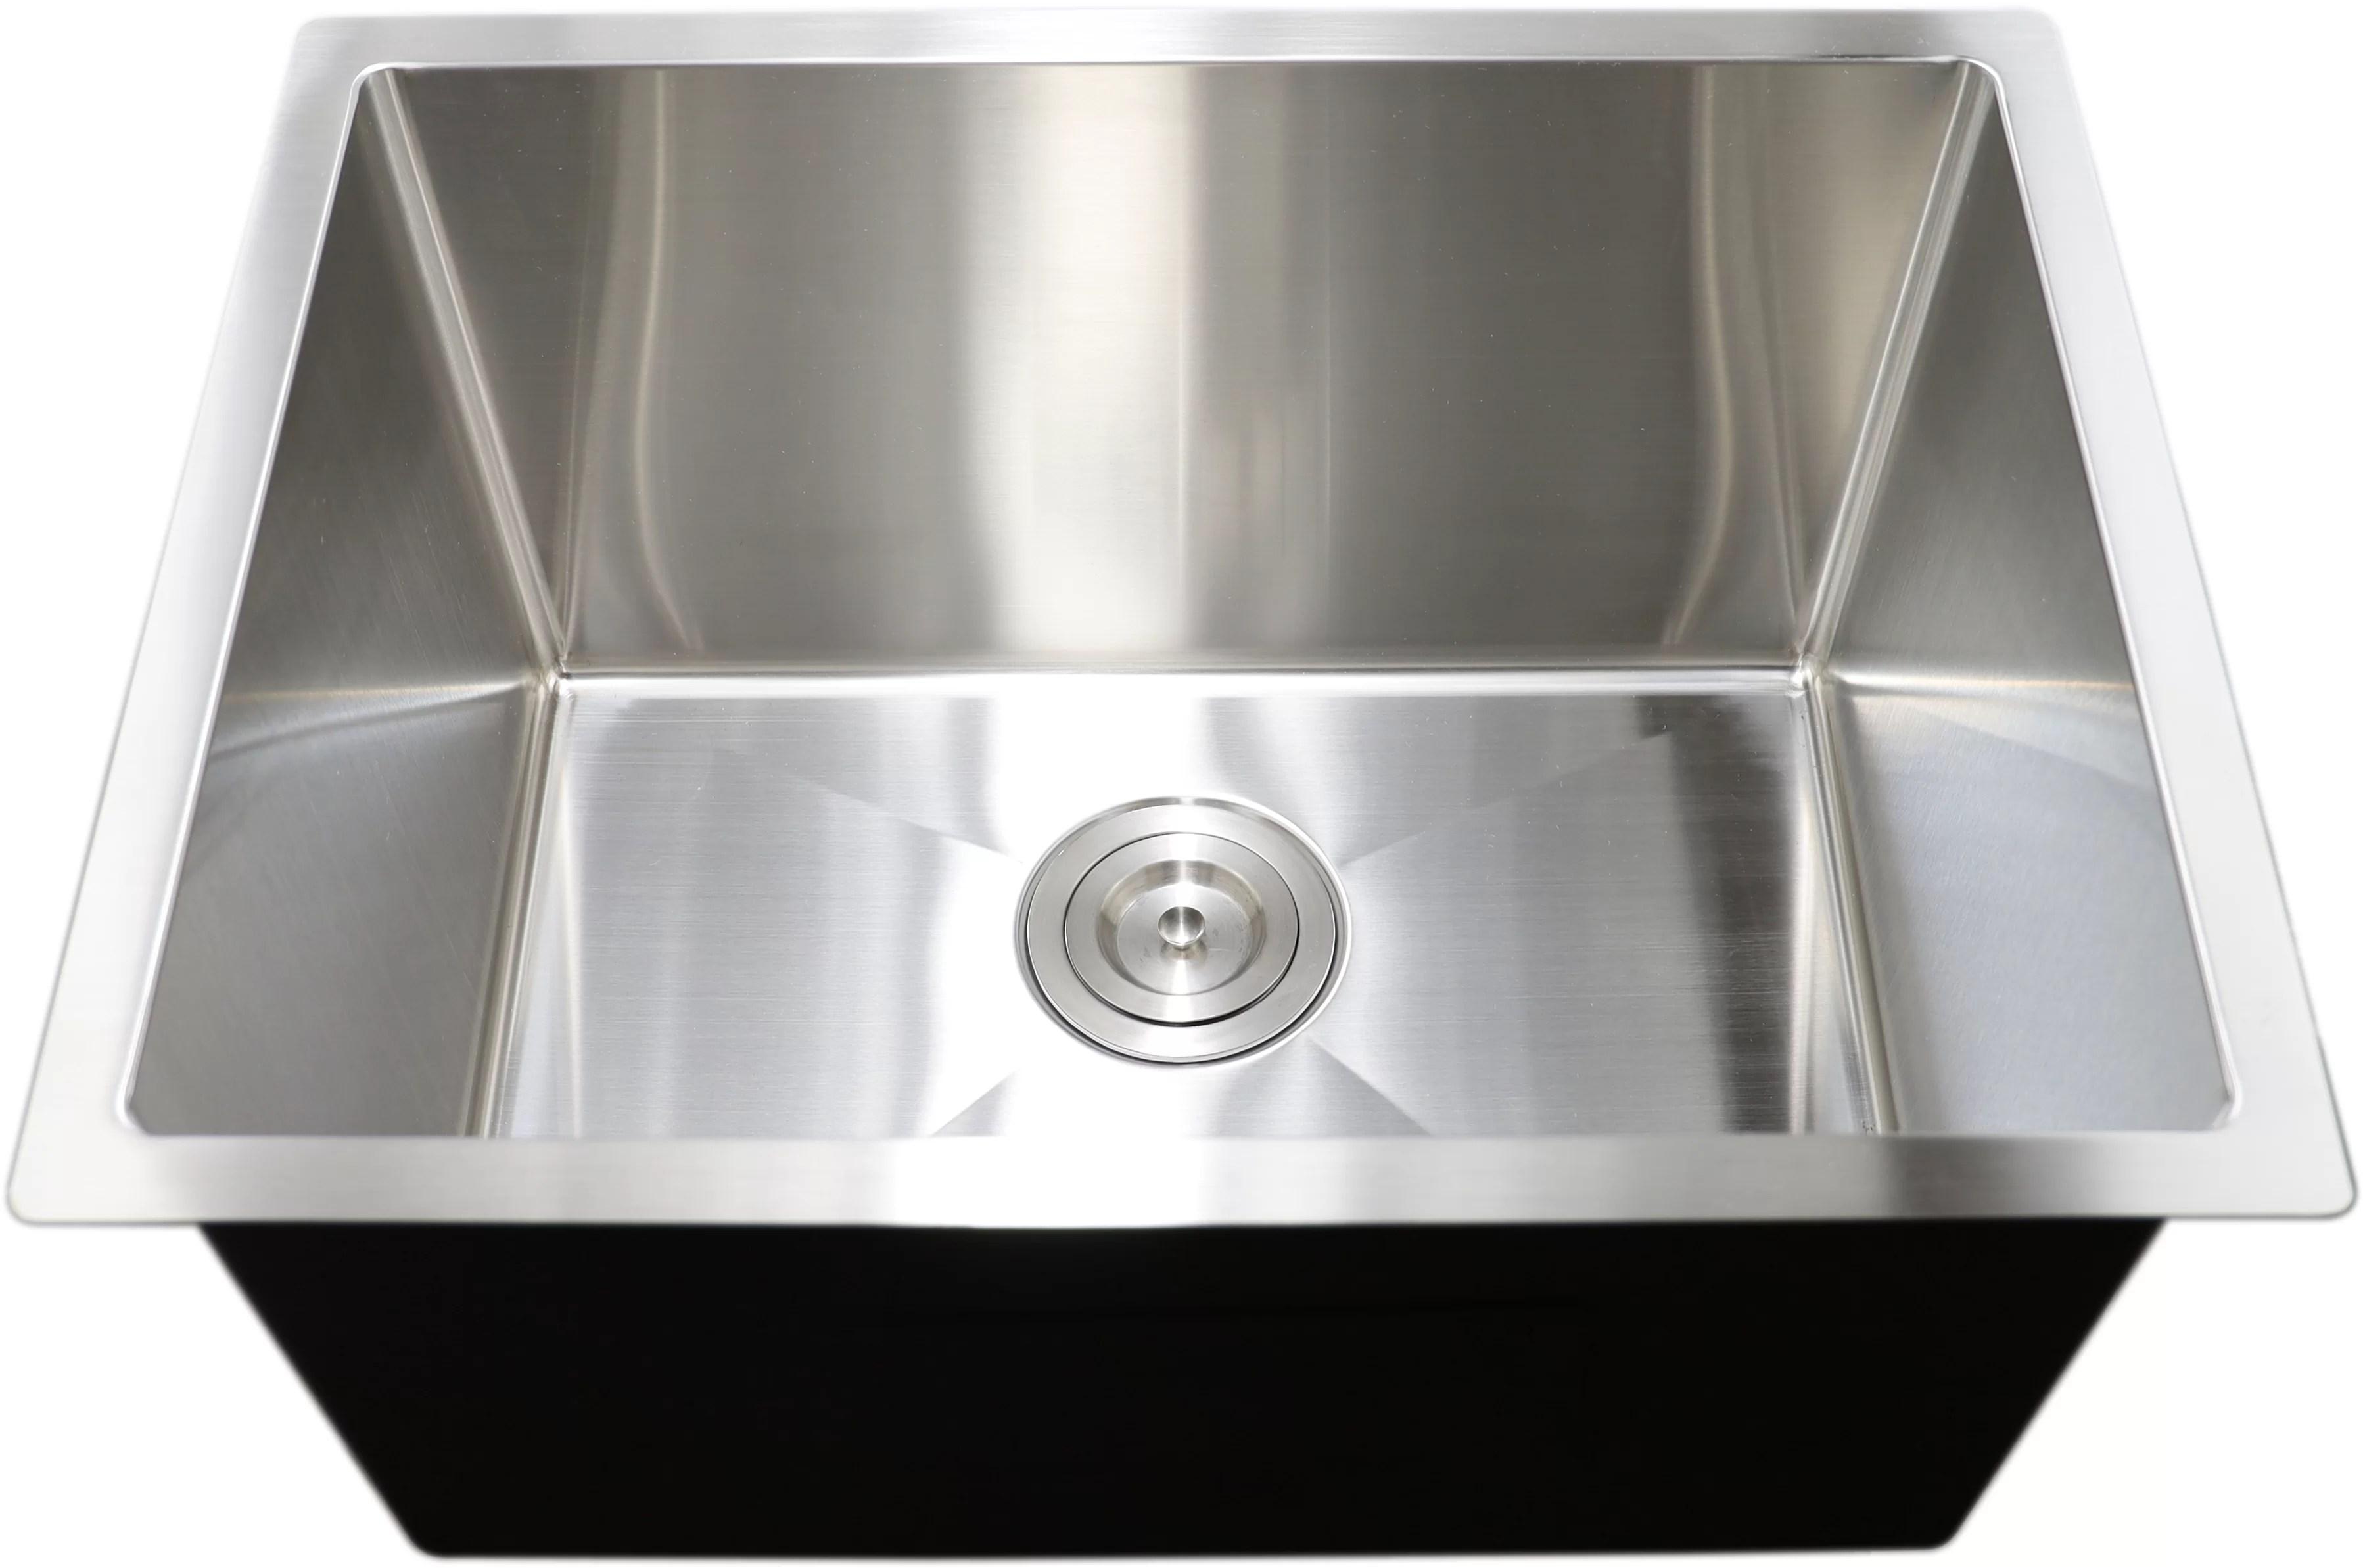 premium stainless steel 23 x 18 undermount laundry sink